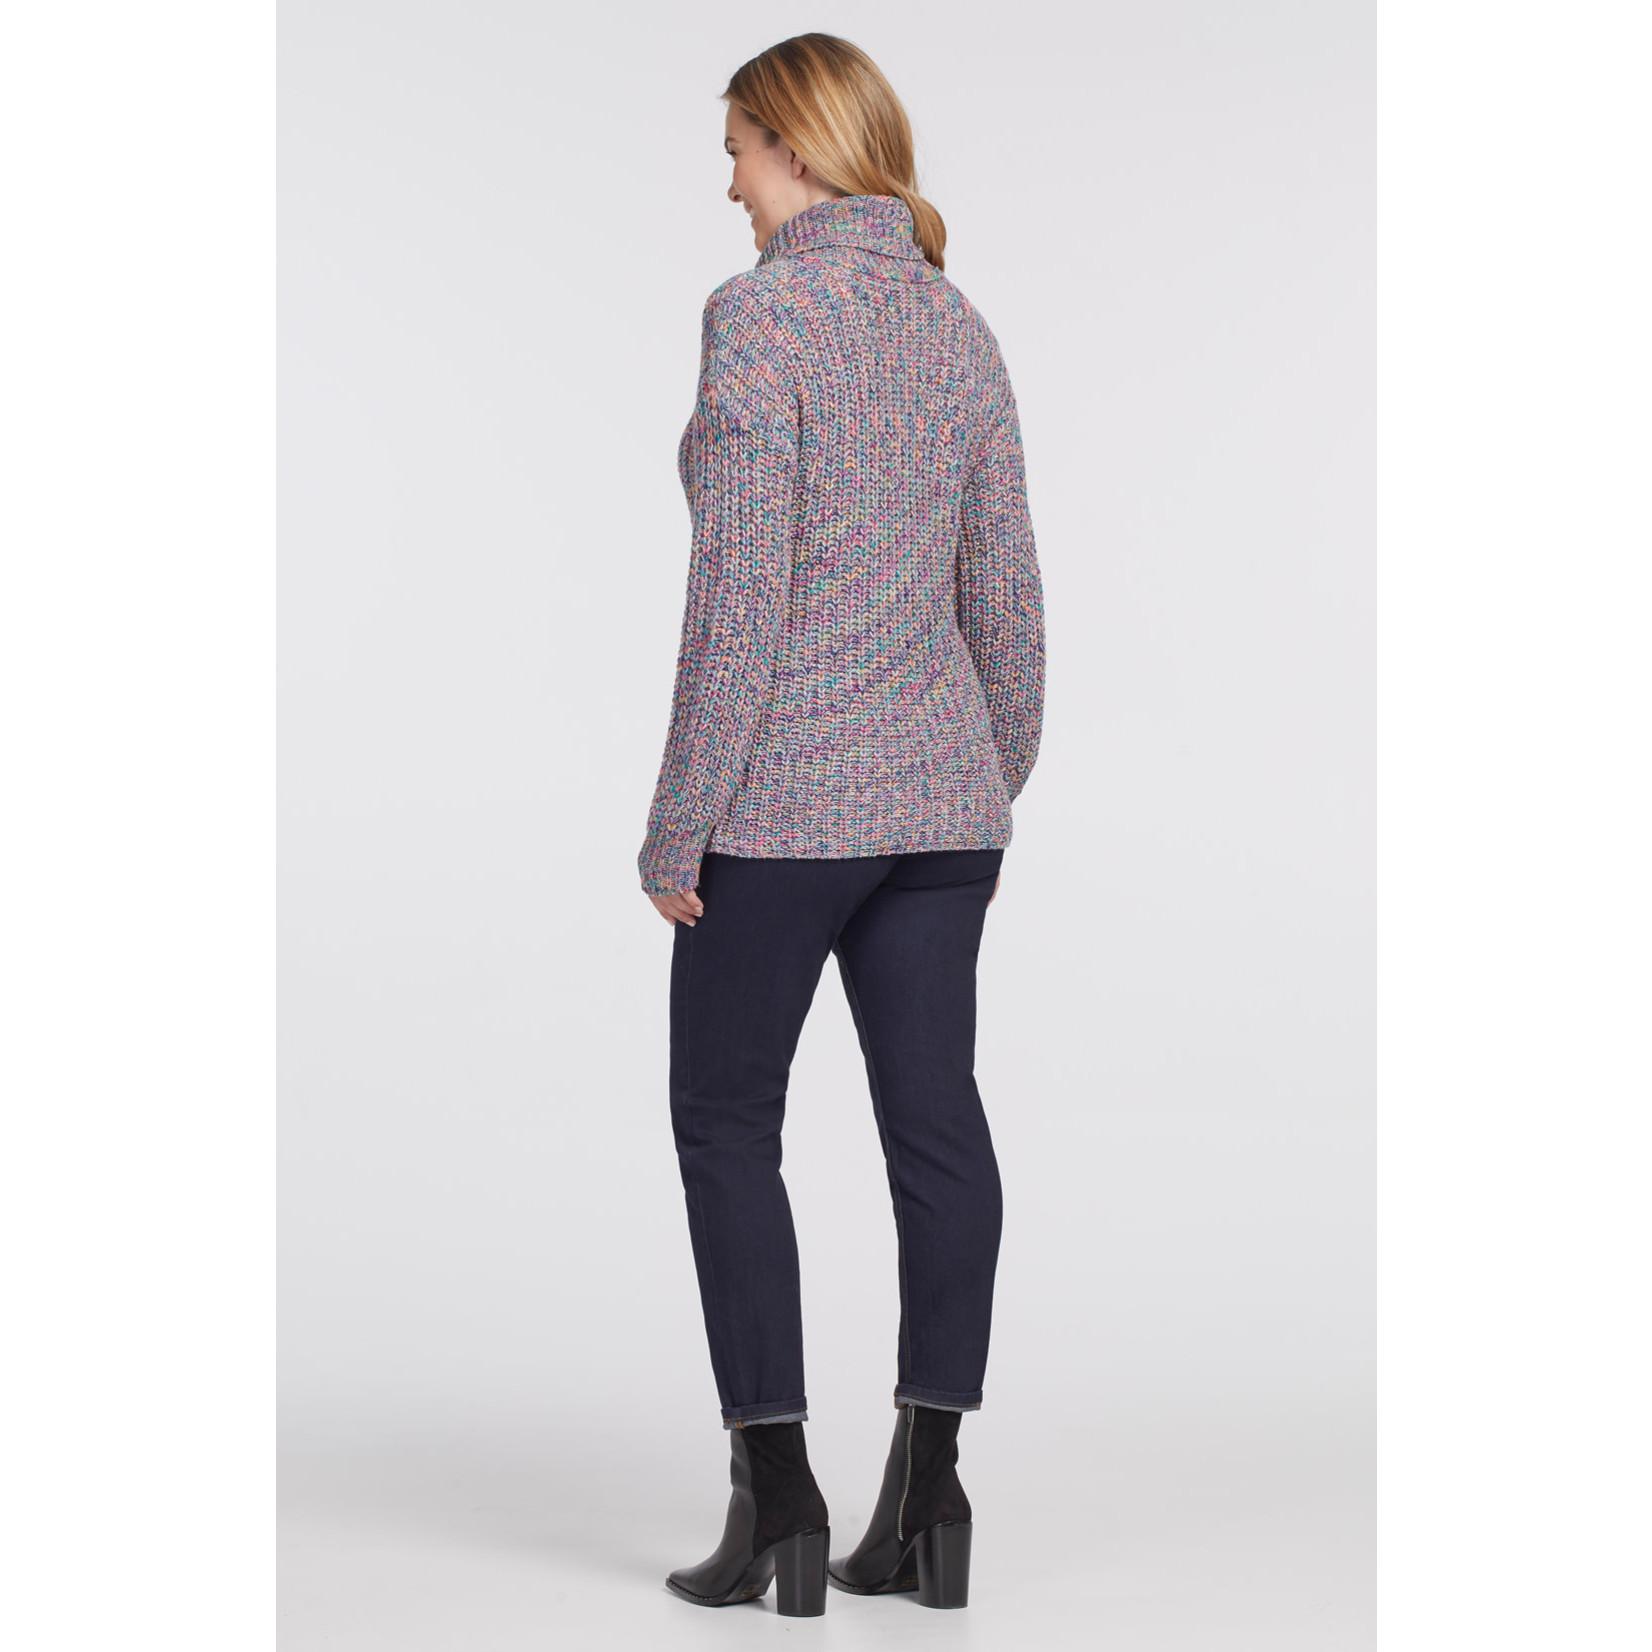 Tribal Turtleneck Sweater